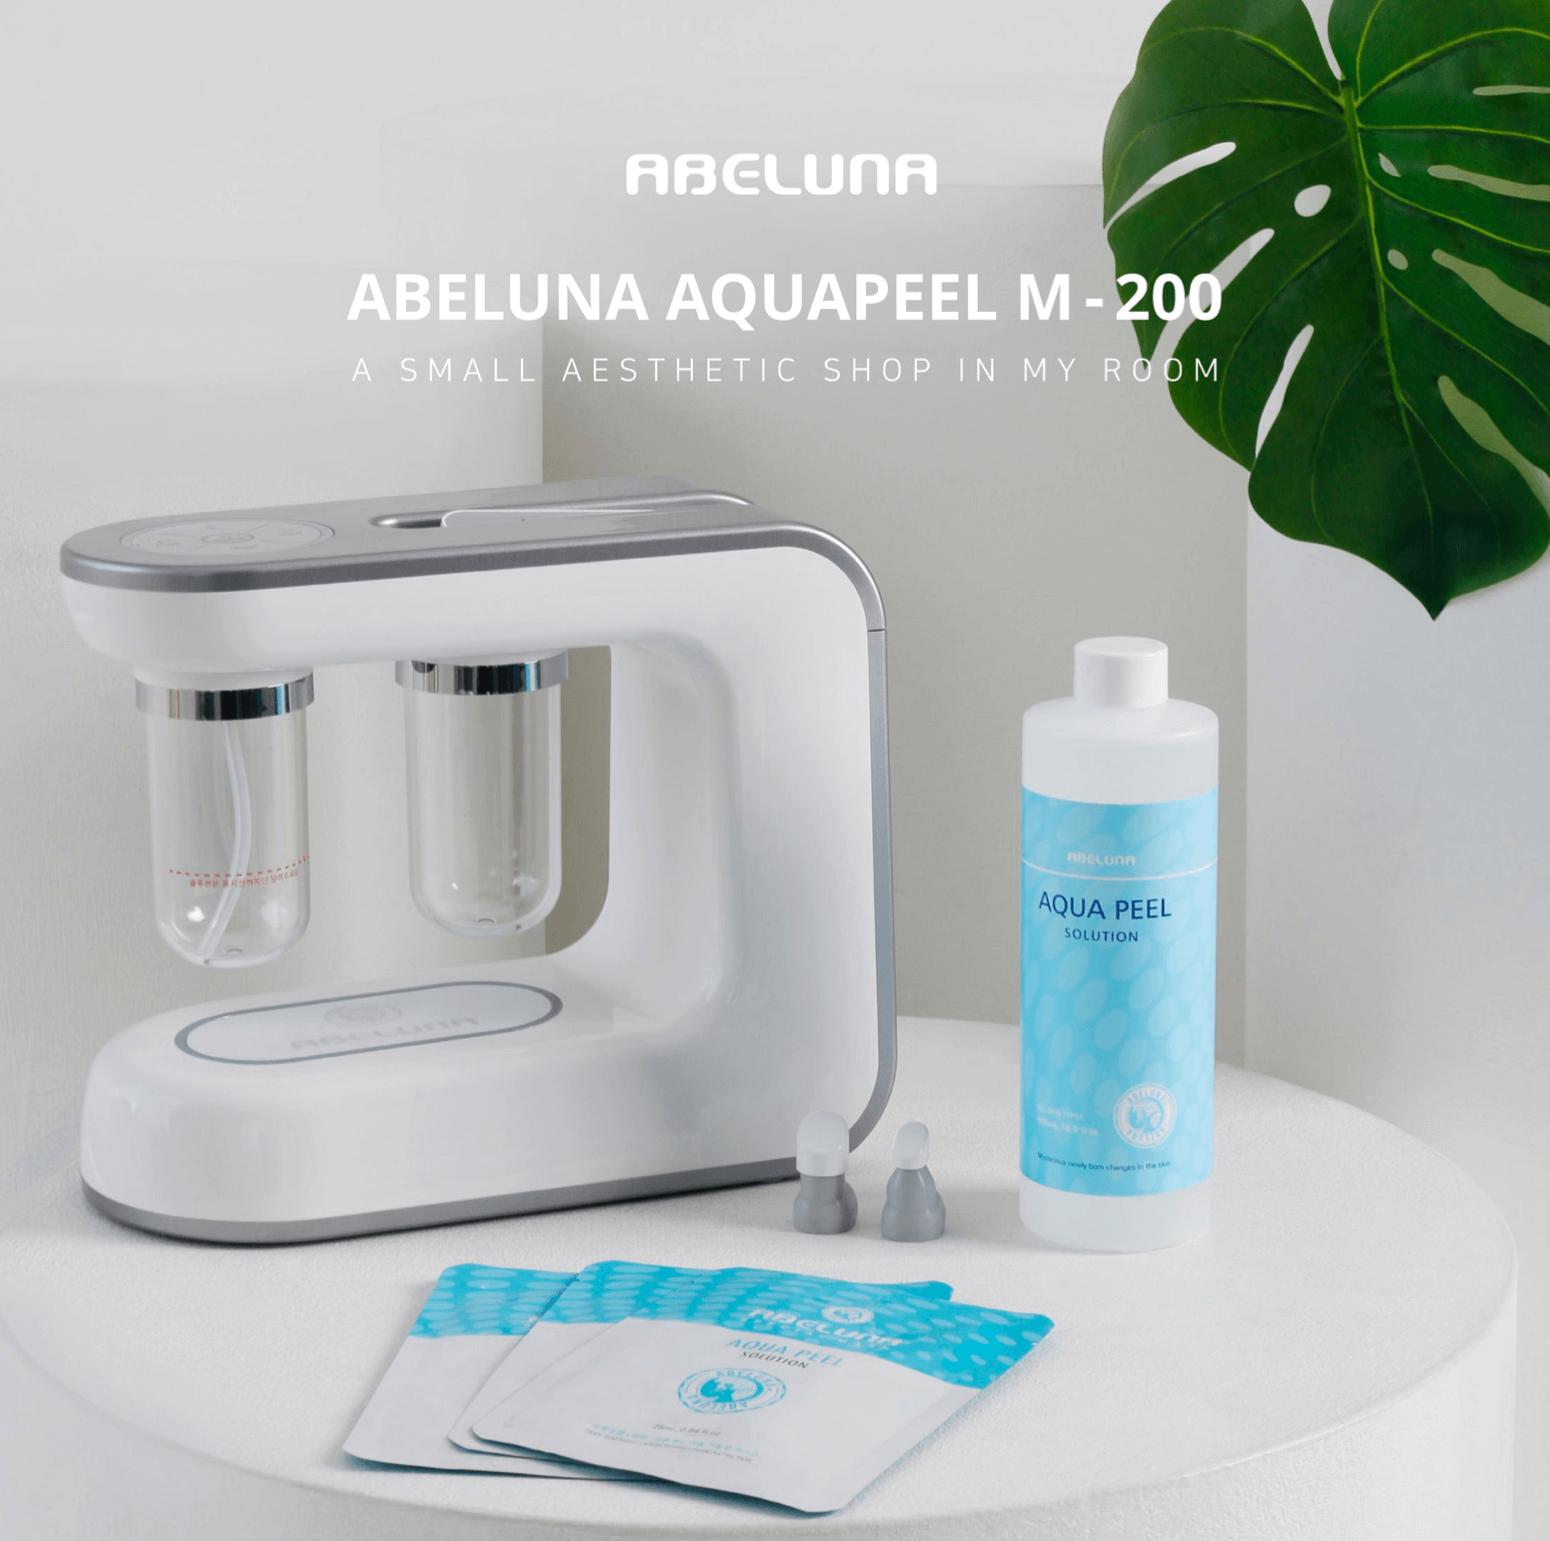 Abeluna aqua-peel M-200_1